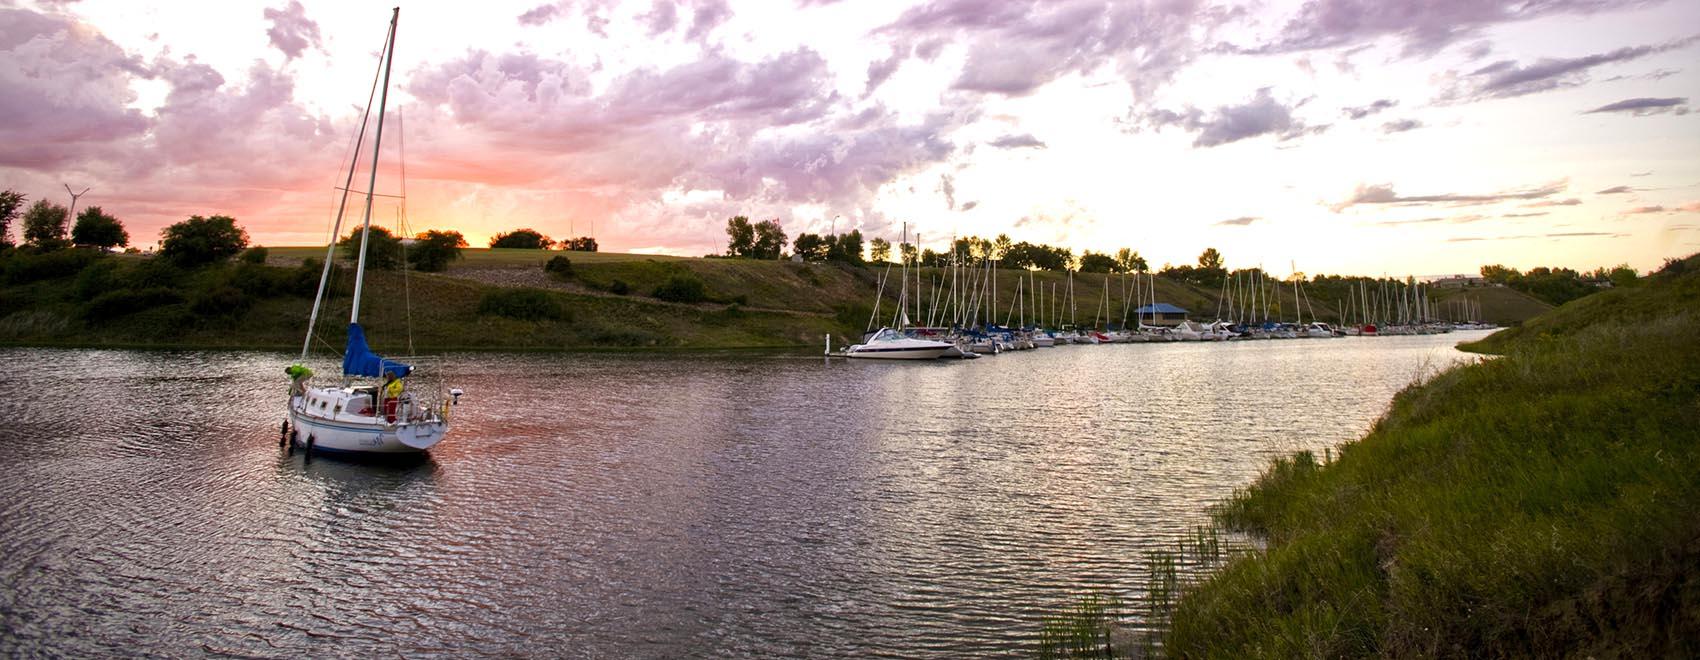 Elbow Marina Photo credit: Tourism Saskatchewan/Paul Austring